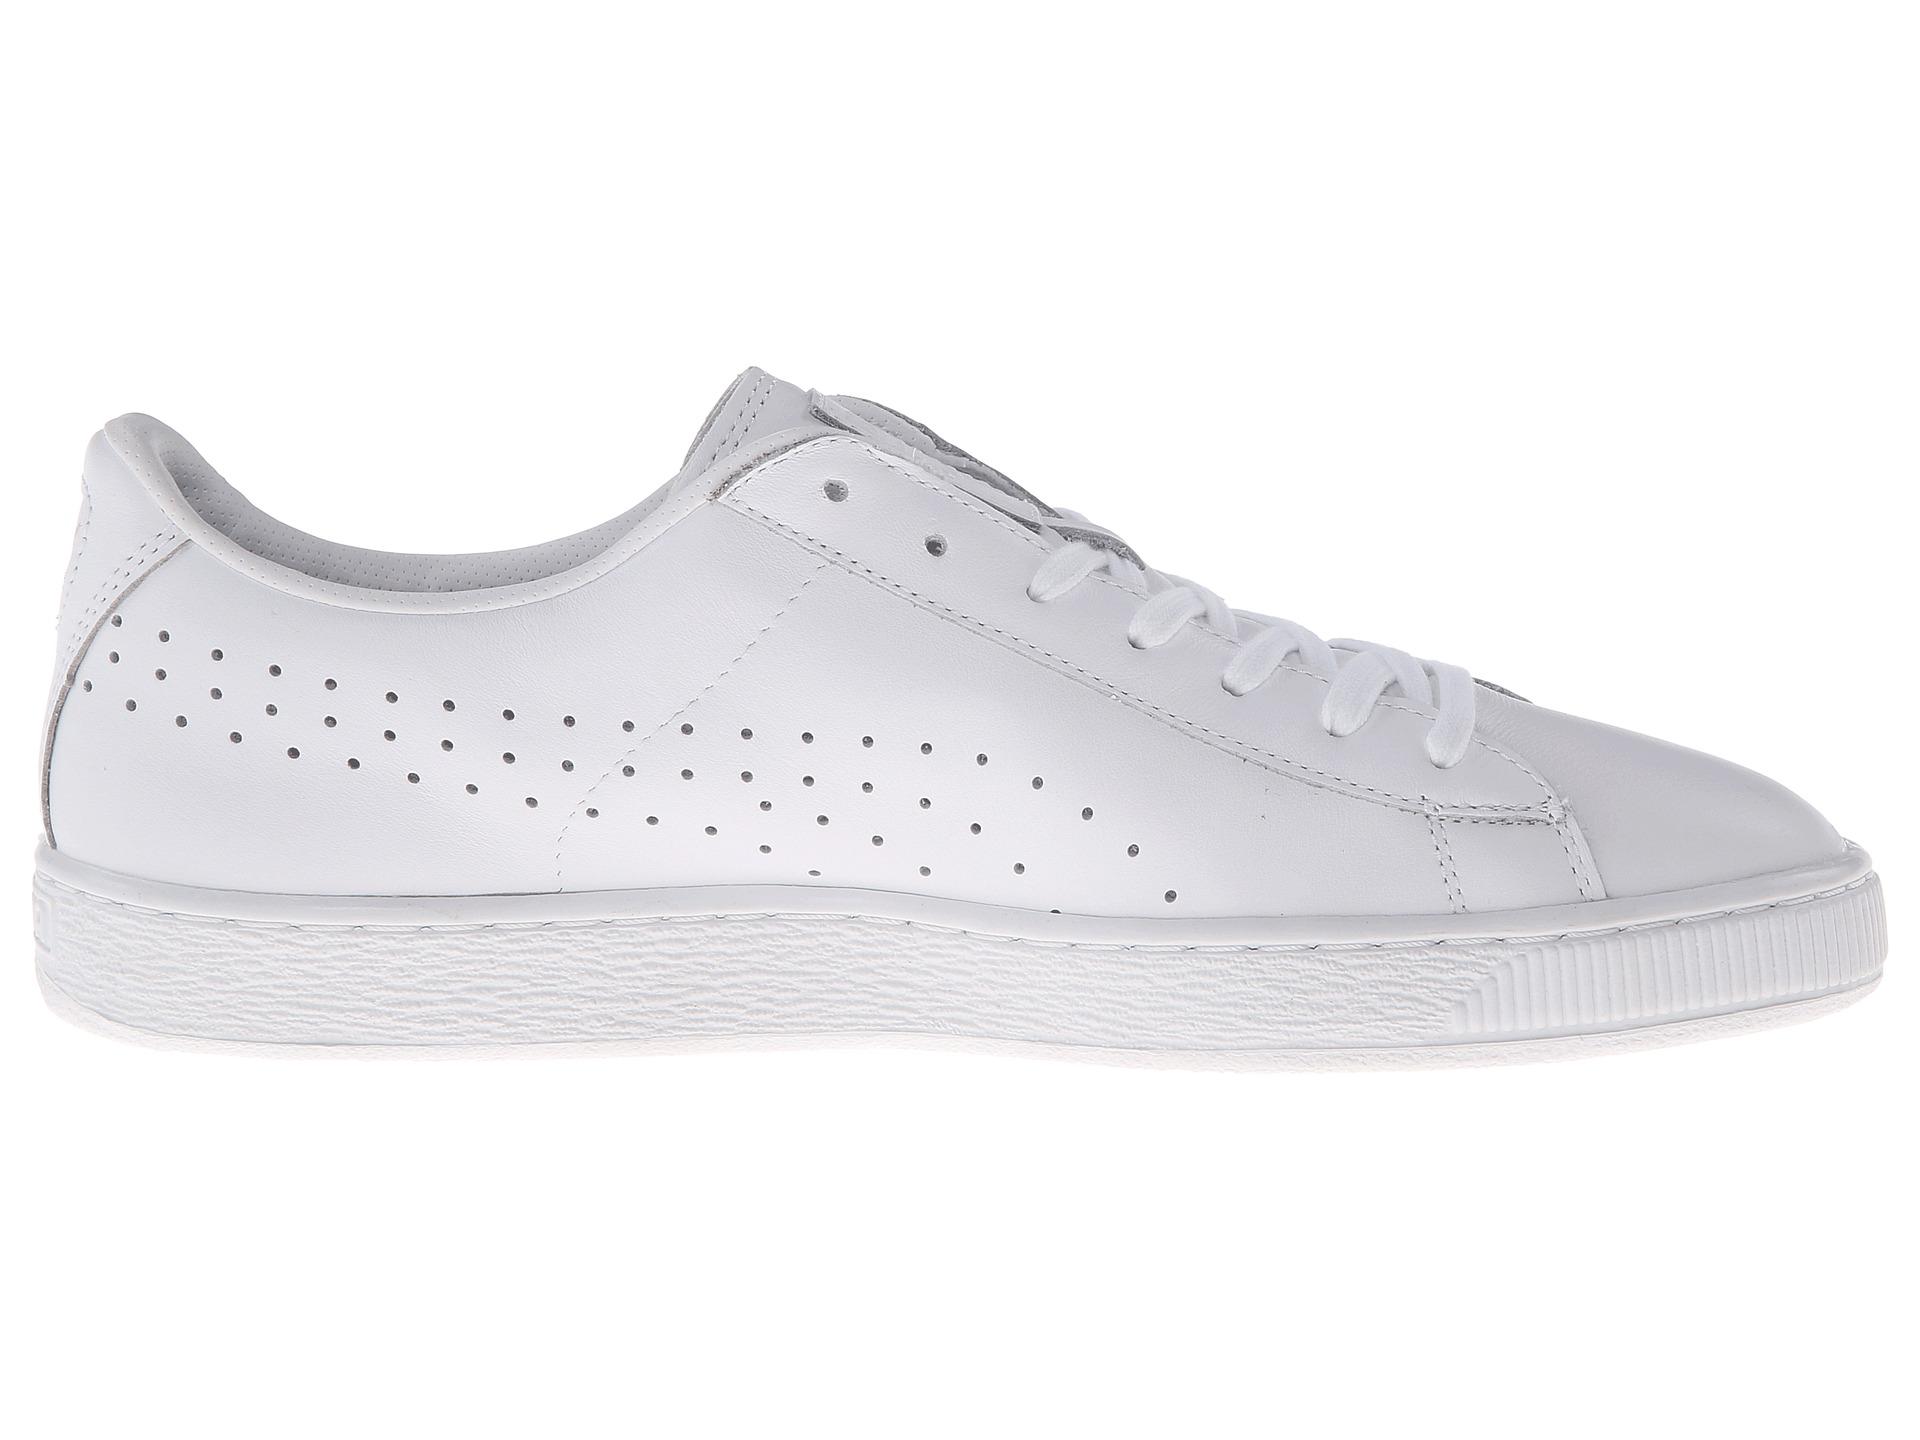 Puma Basket All White